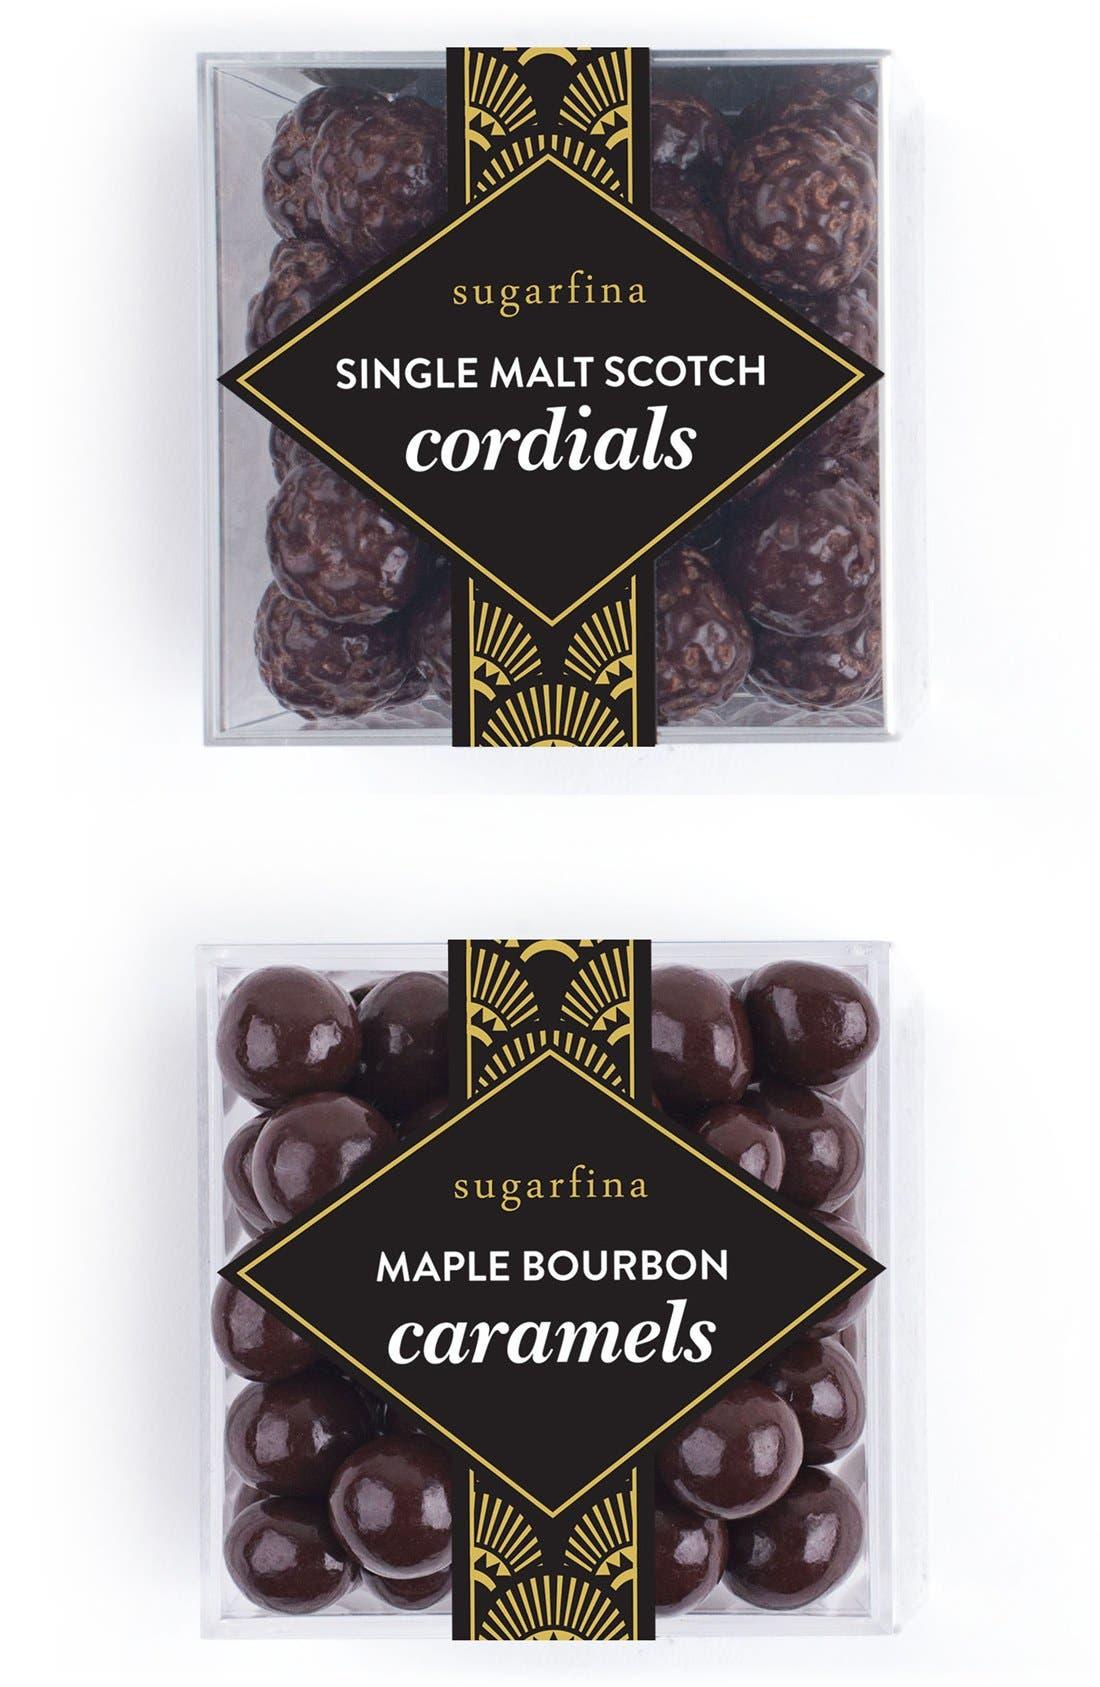 sugarfina 'Scotch & Bourbon' Candy Boxes (Set of 2)